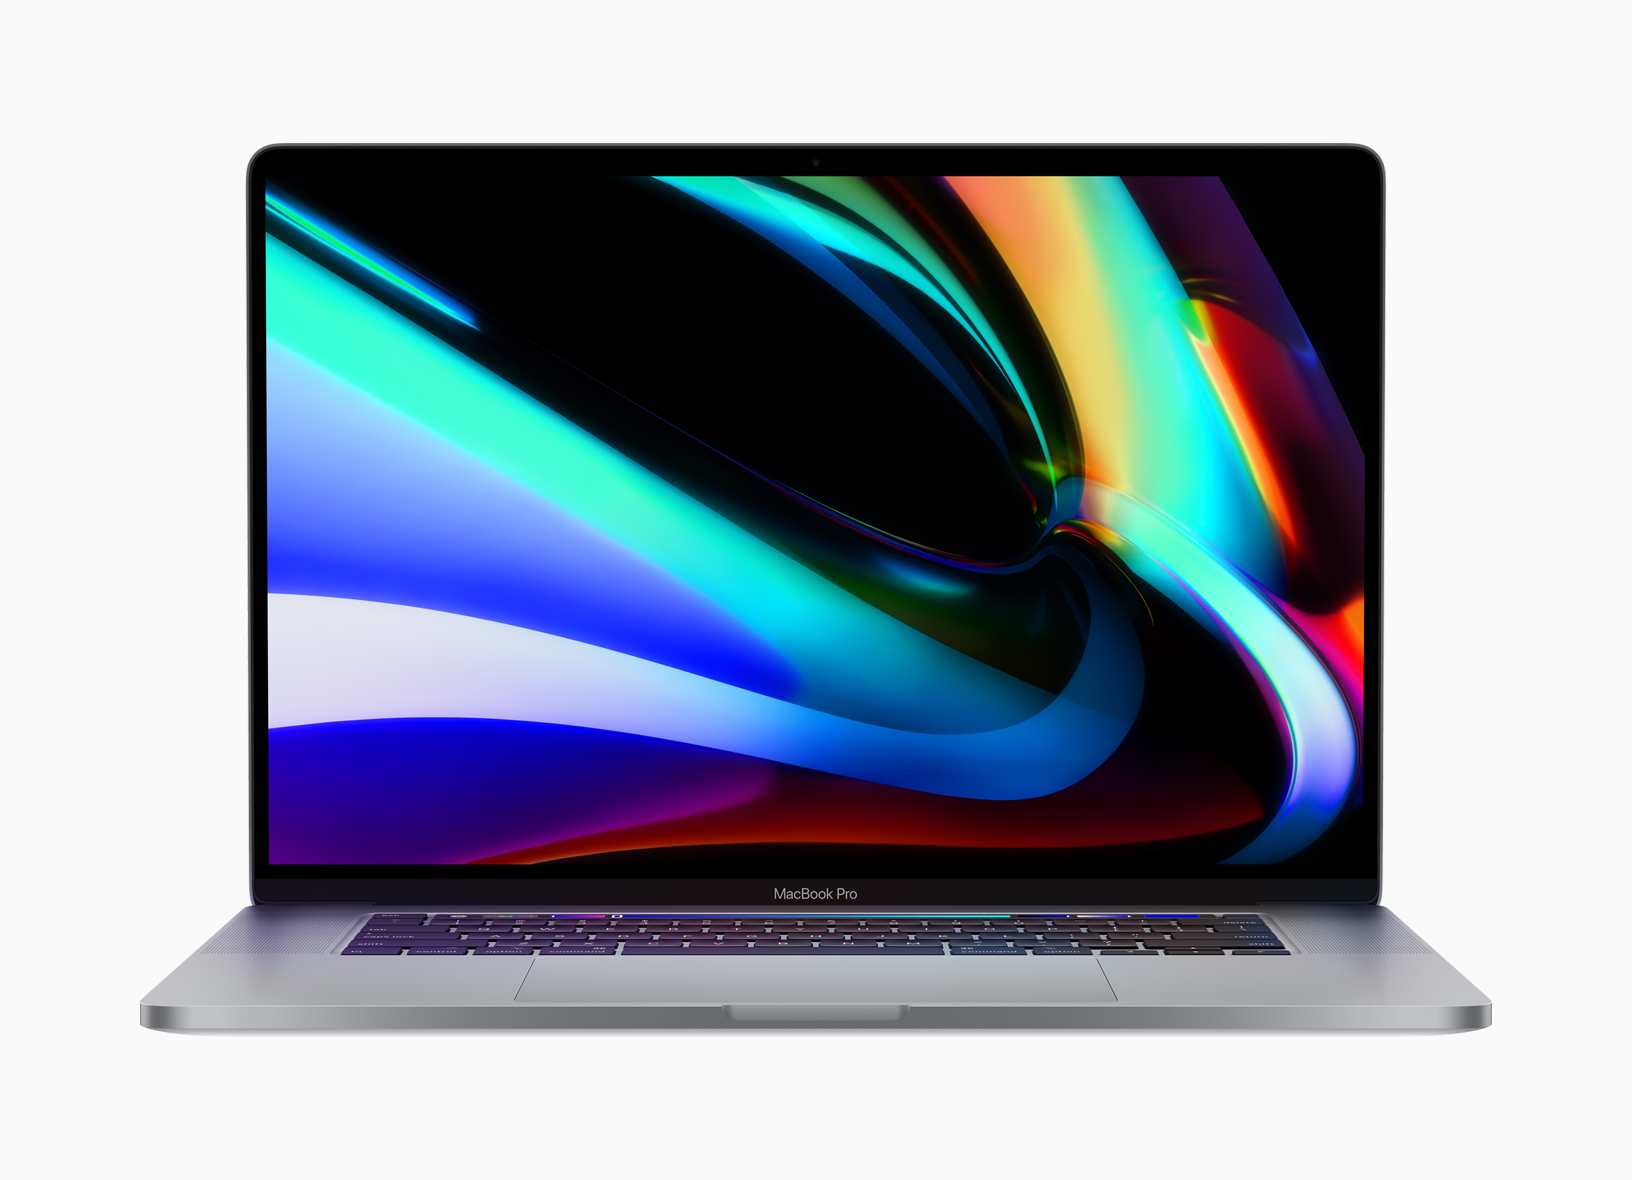 MacBook Pro 16 นิ้ว ใหม่คือโน้ตบุ๊คโปรที่ดีที่สุดในโลก